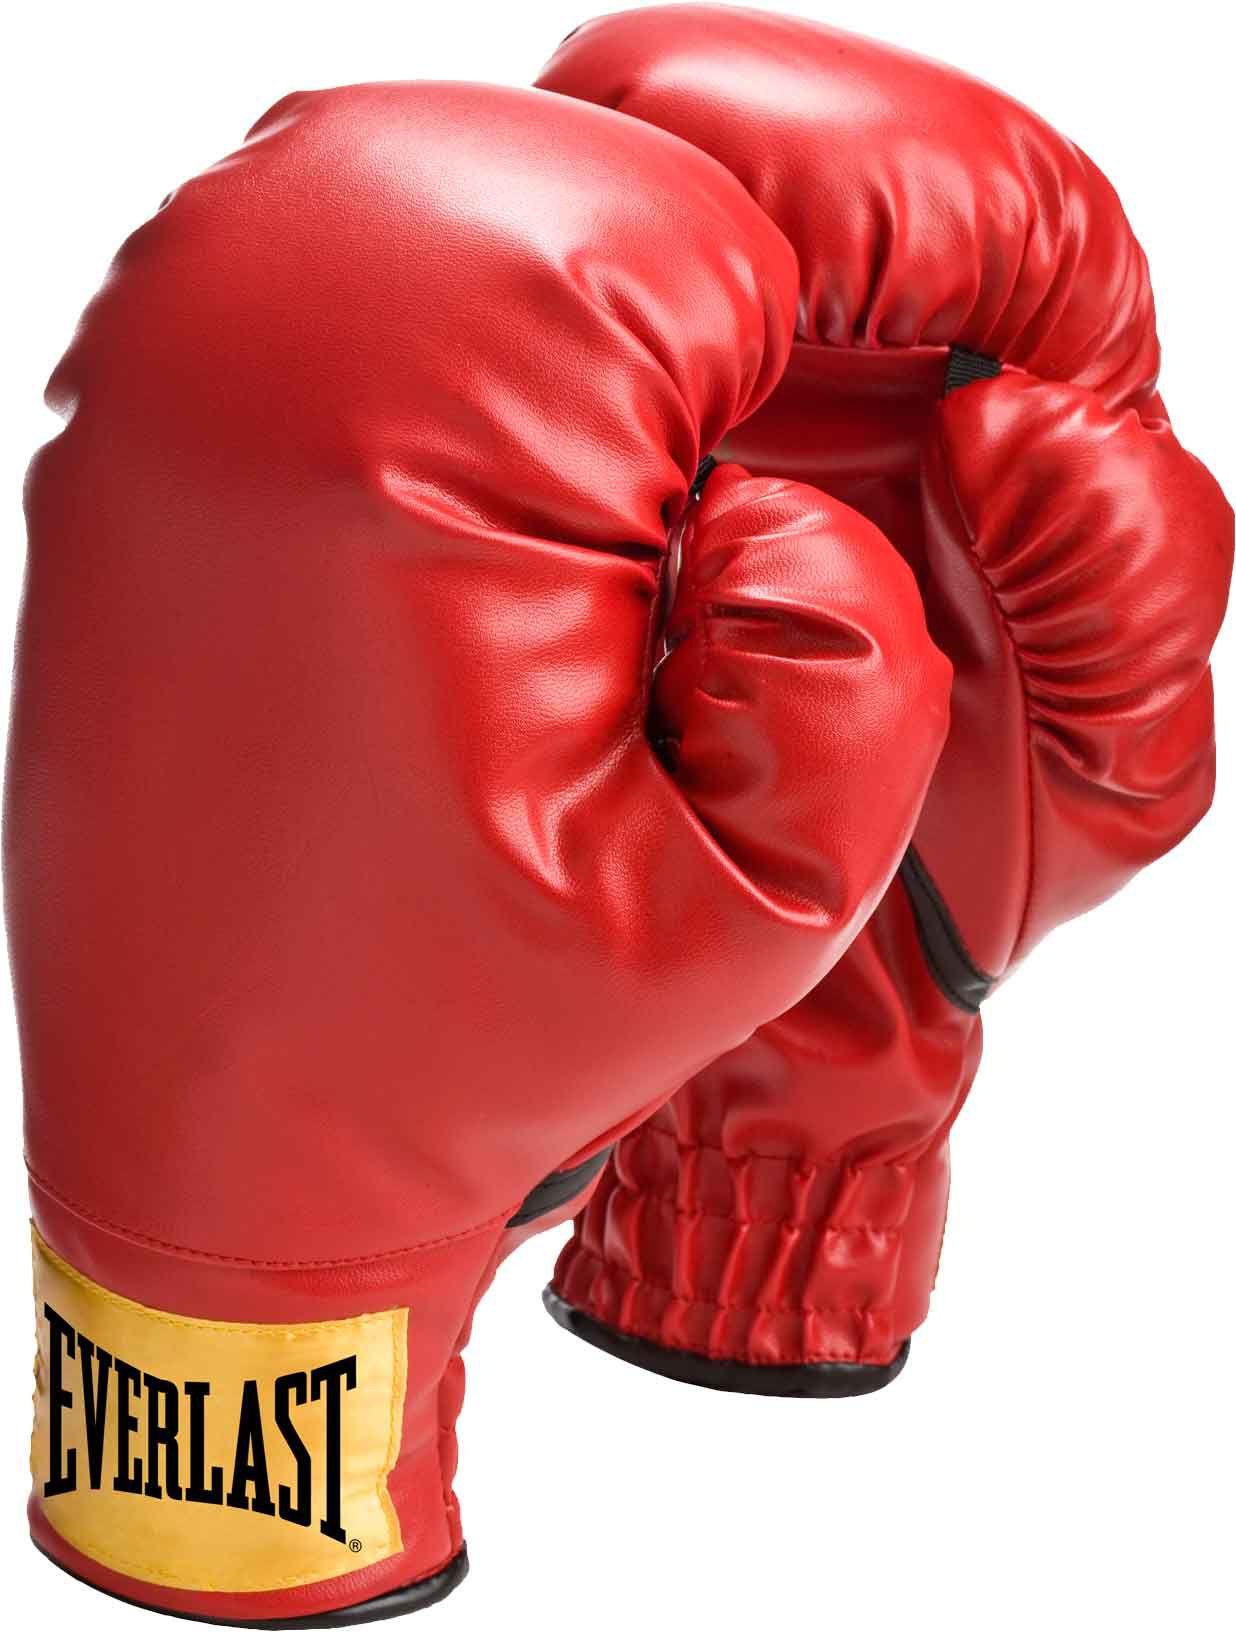 Shiv Naresh Teens Boxing Gloves 12oz: Everlast Youth Boxing Gloves